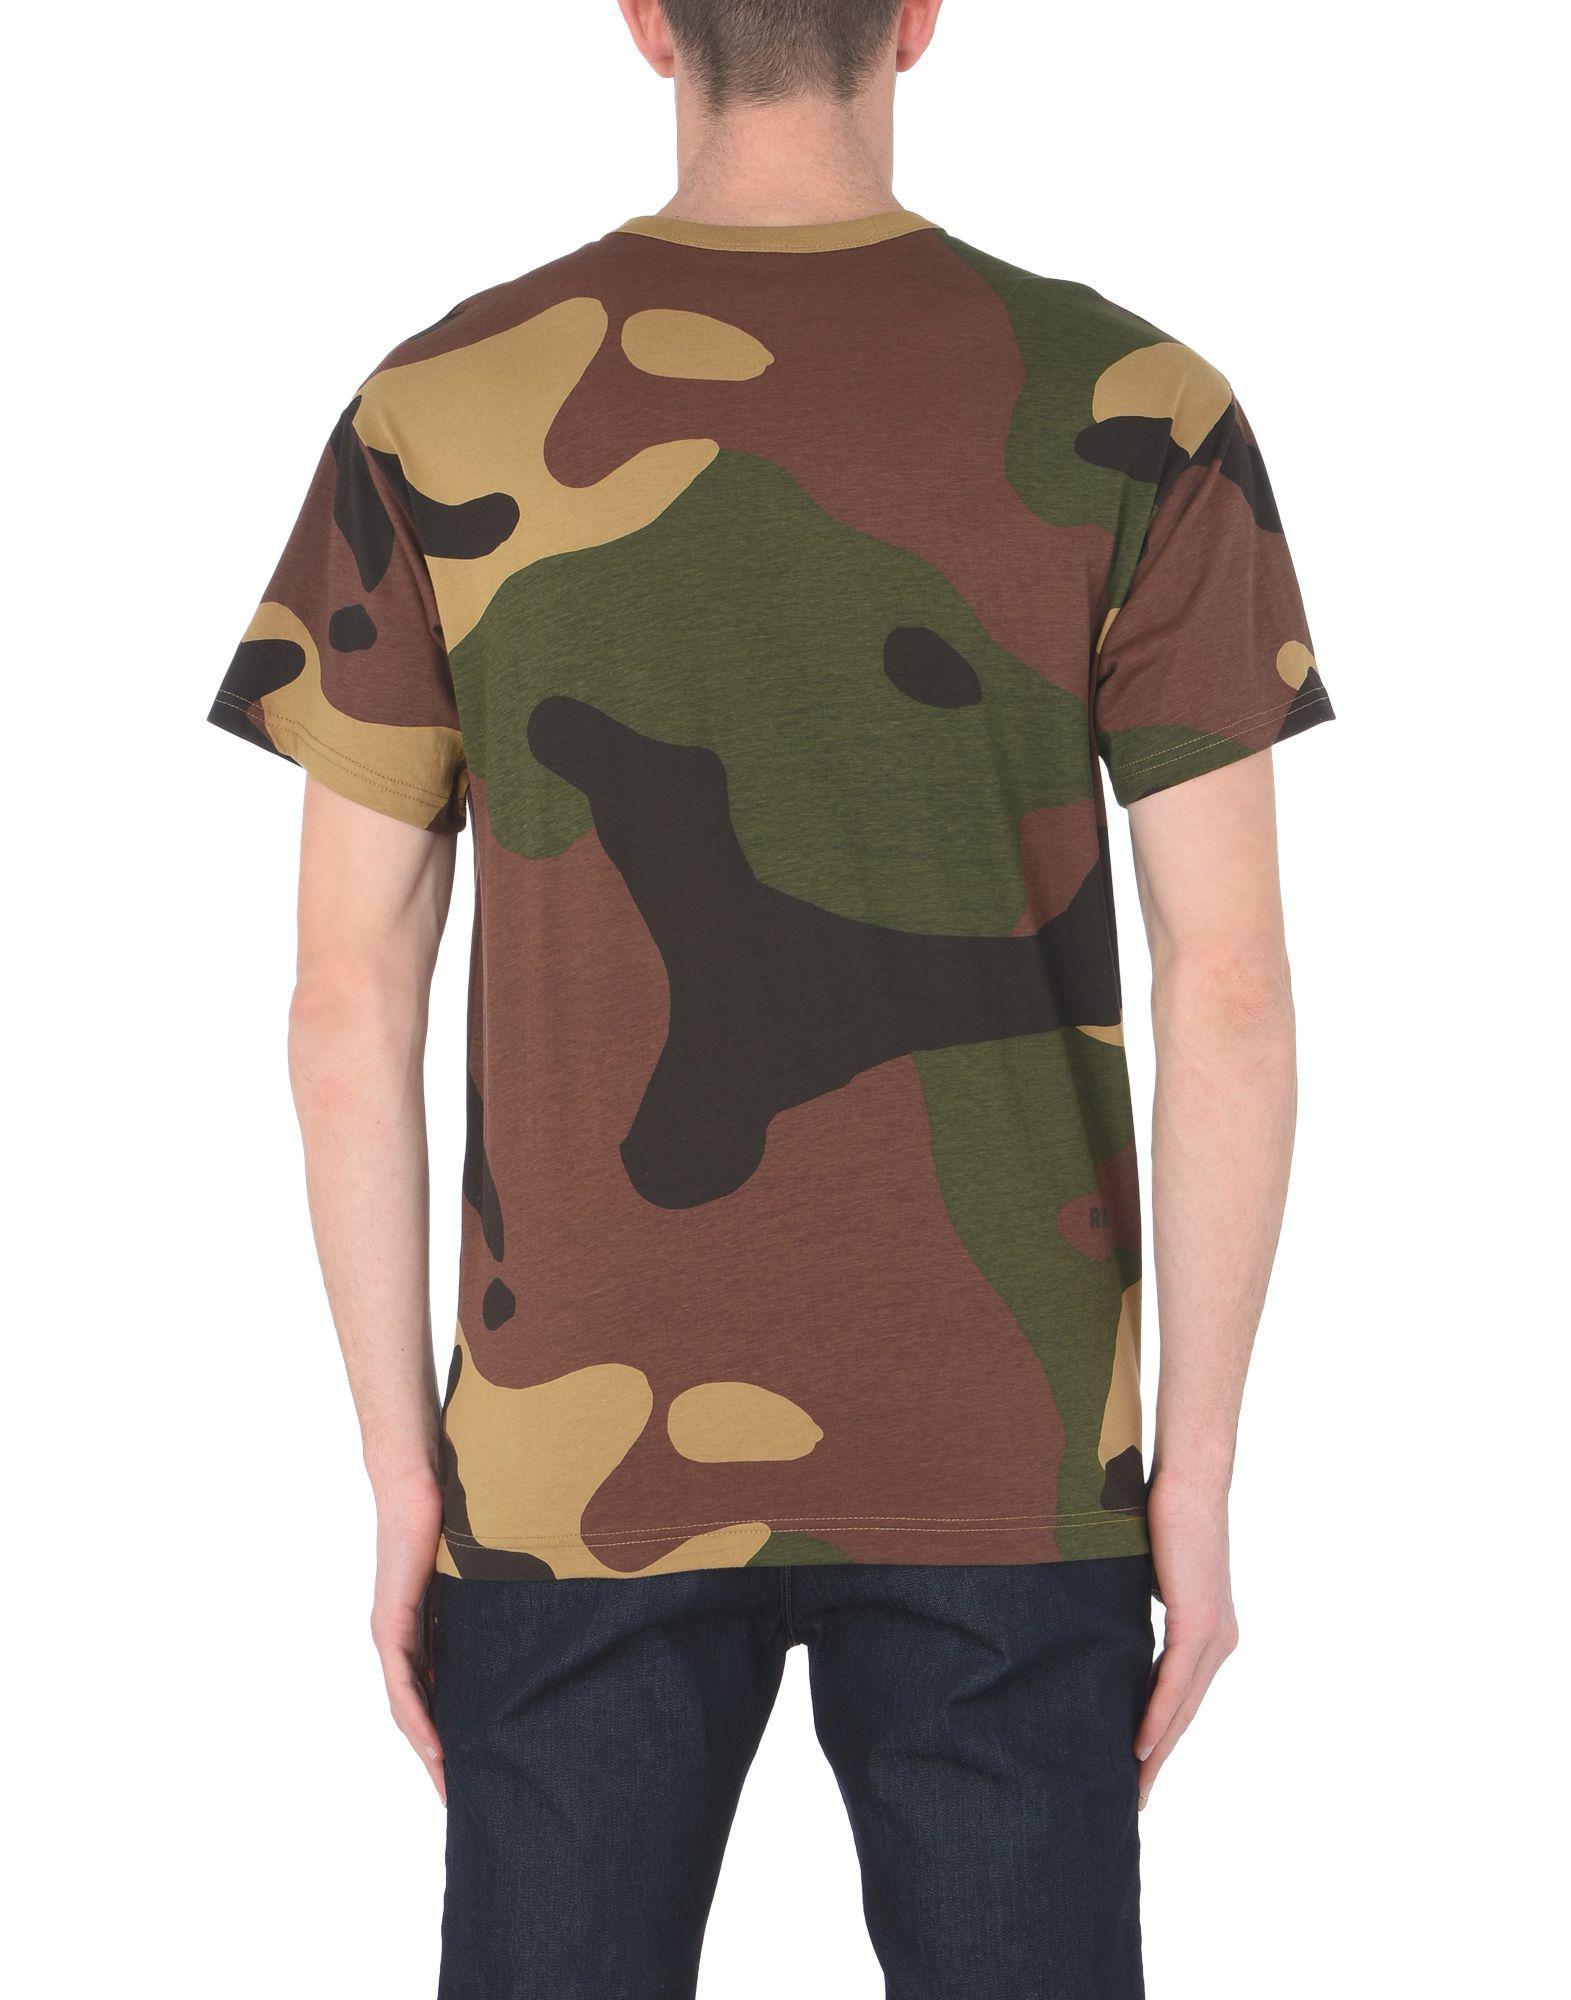 c37ec0e9fa G-Star RAW T-shirt in Brown for Men - Lyst